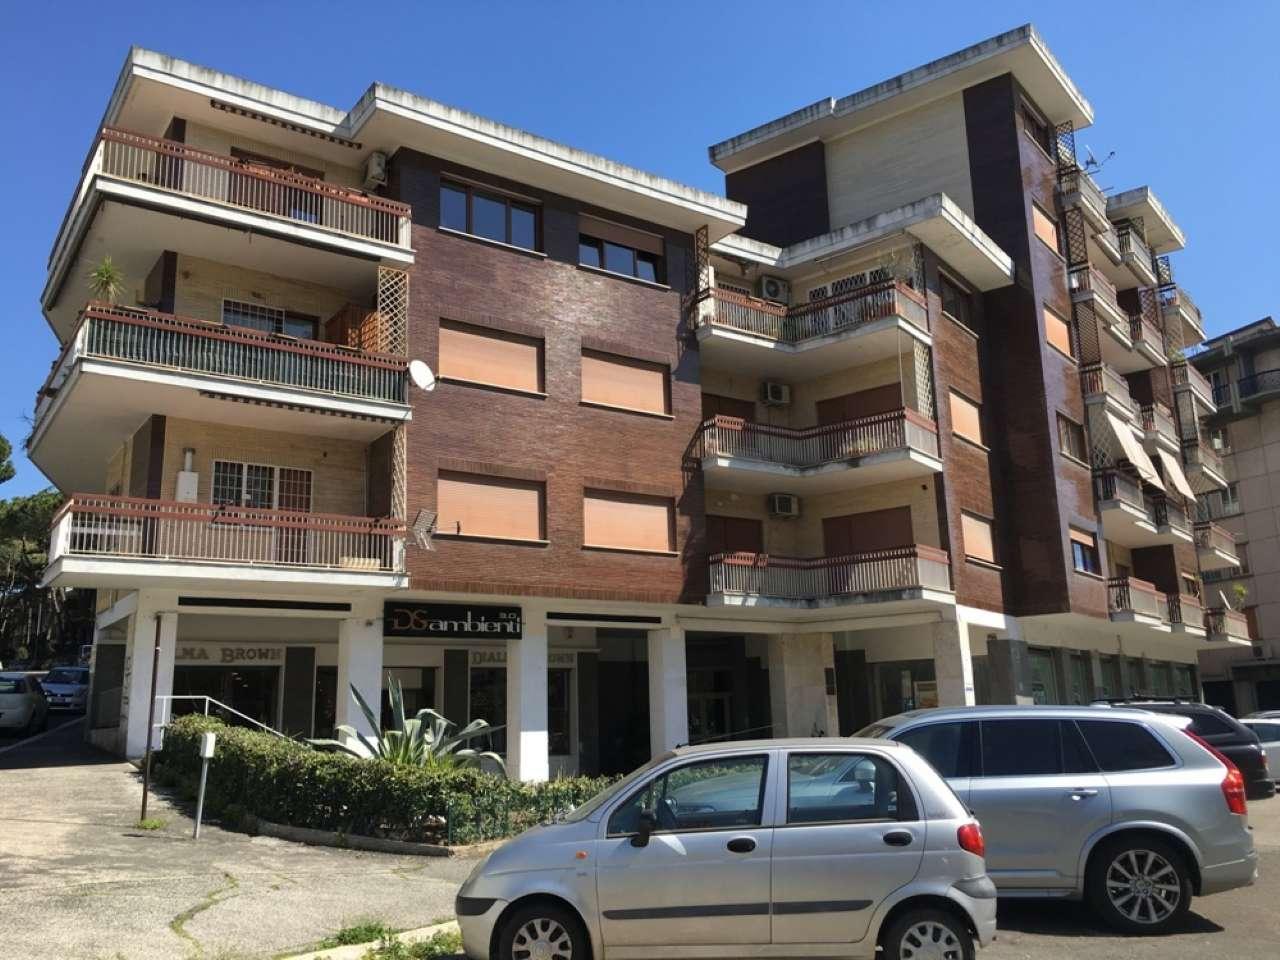 roma vendita quart: nuovo salario unicredit subitocasa - centro